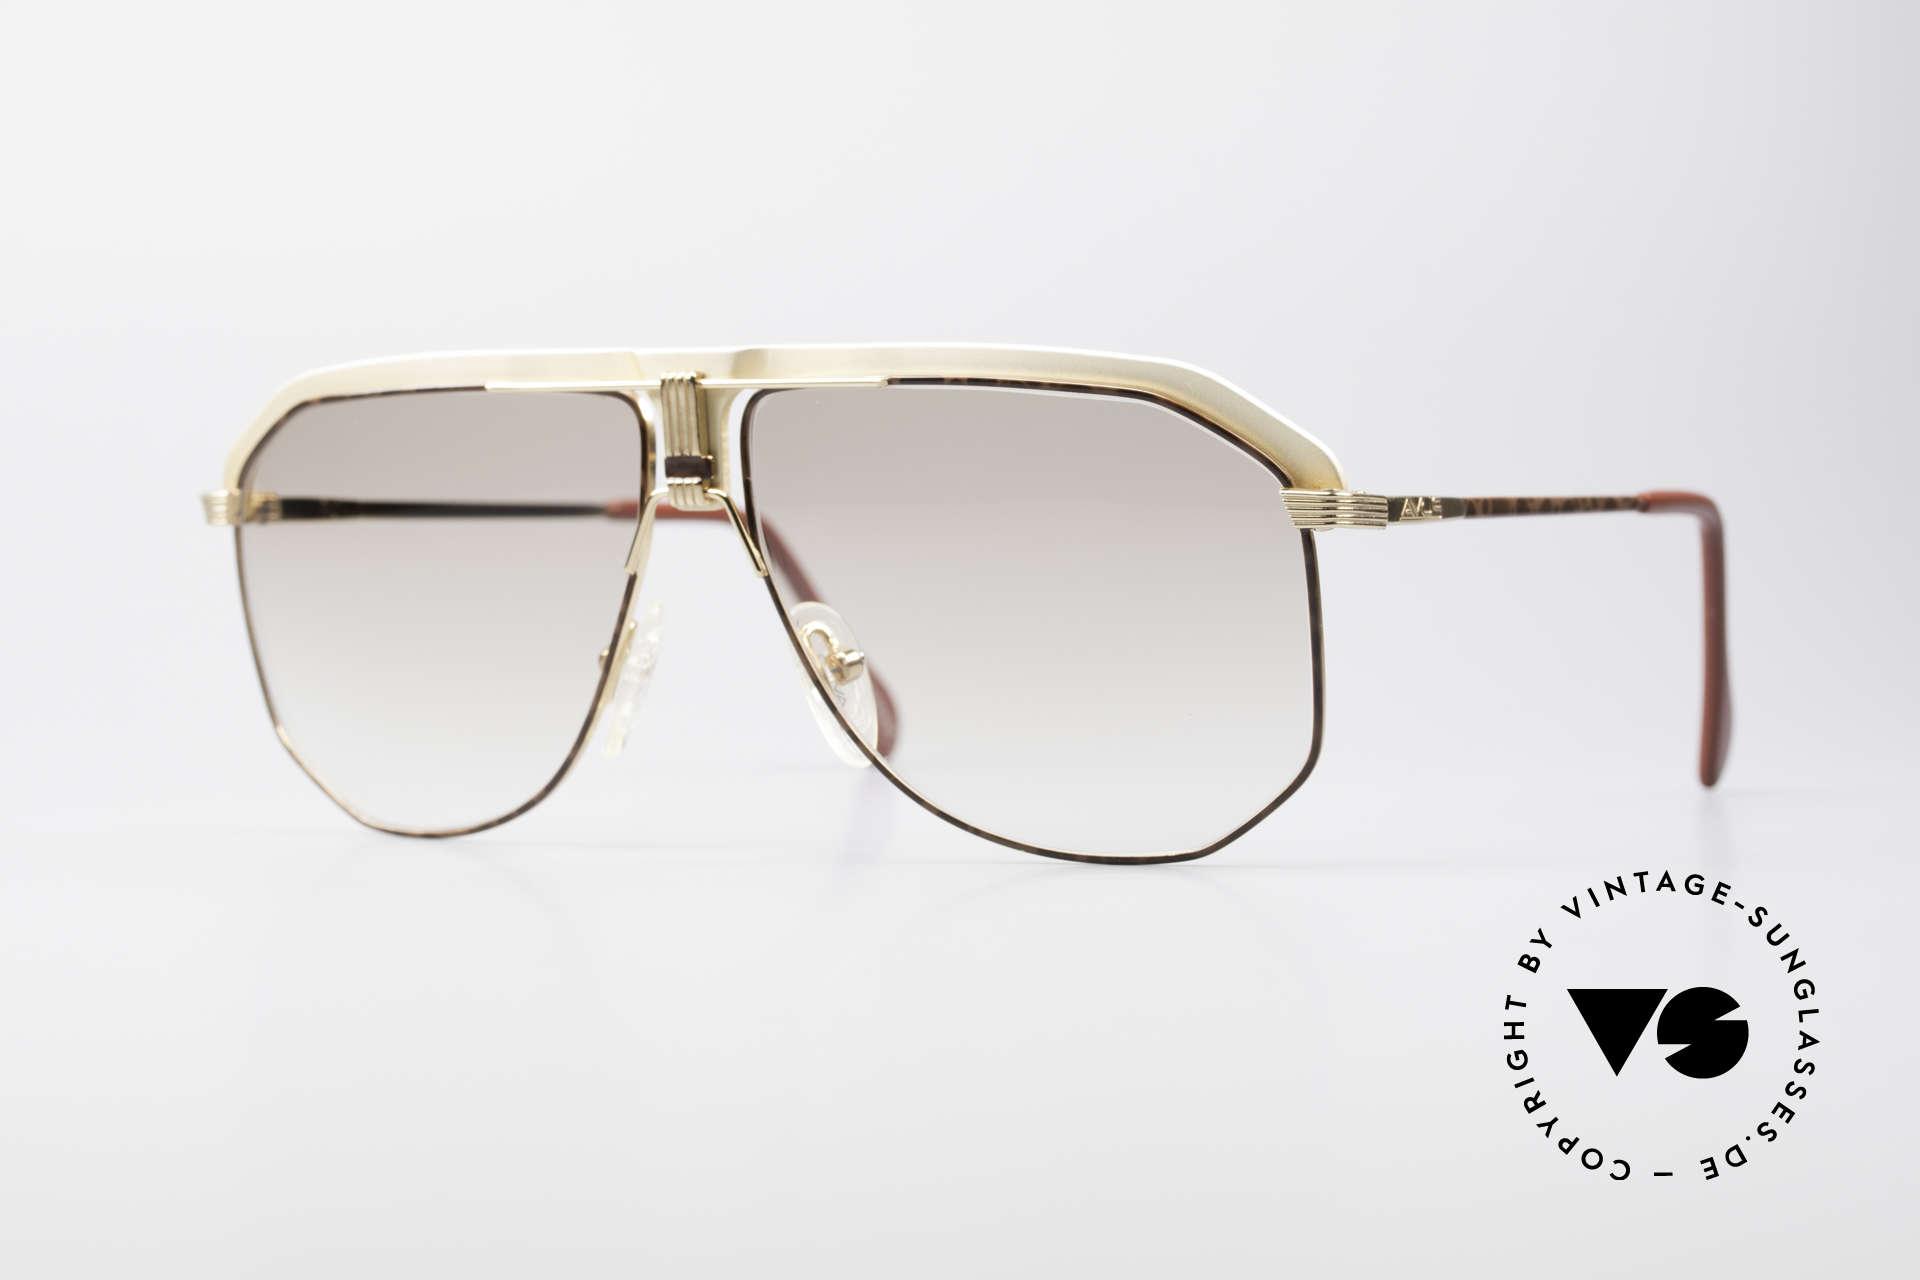 AVUS 2-130 Men's Luxury 80's Shades, premium AVUS vintage 80's designer sunglasses, Made for Men